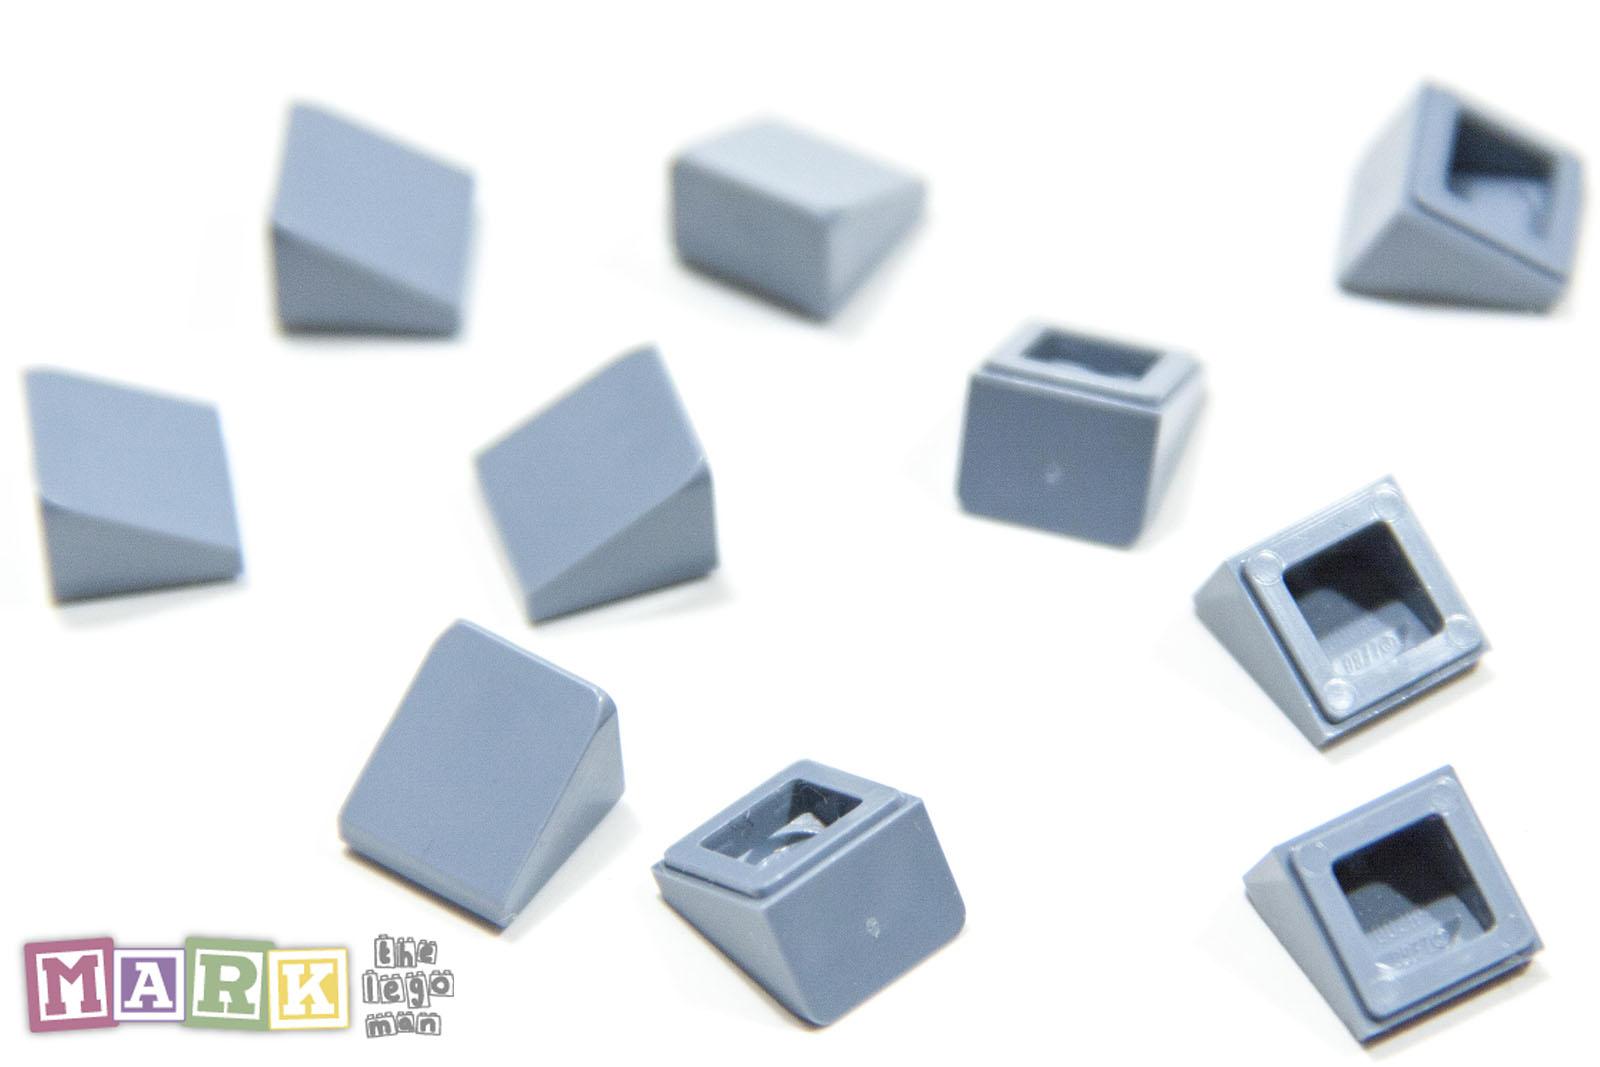 10 x LEGO 54200 Brique Toit Roof Tile Brick 1x1 Slope NEUF NEW rouge, red